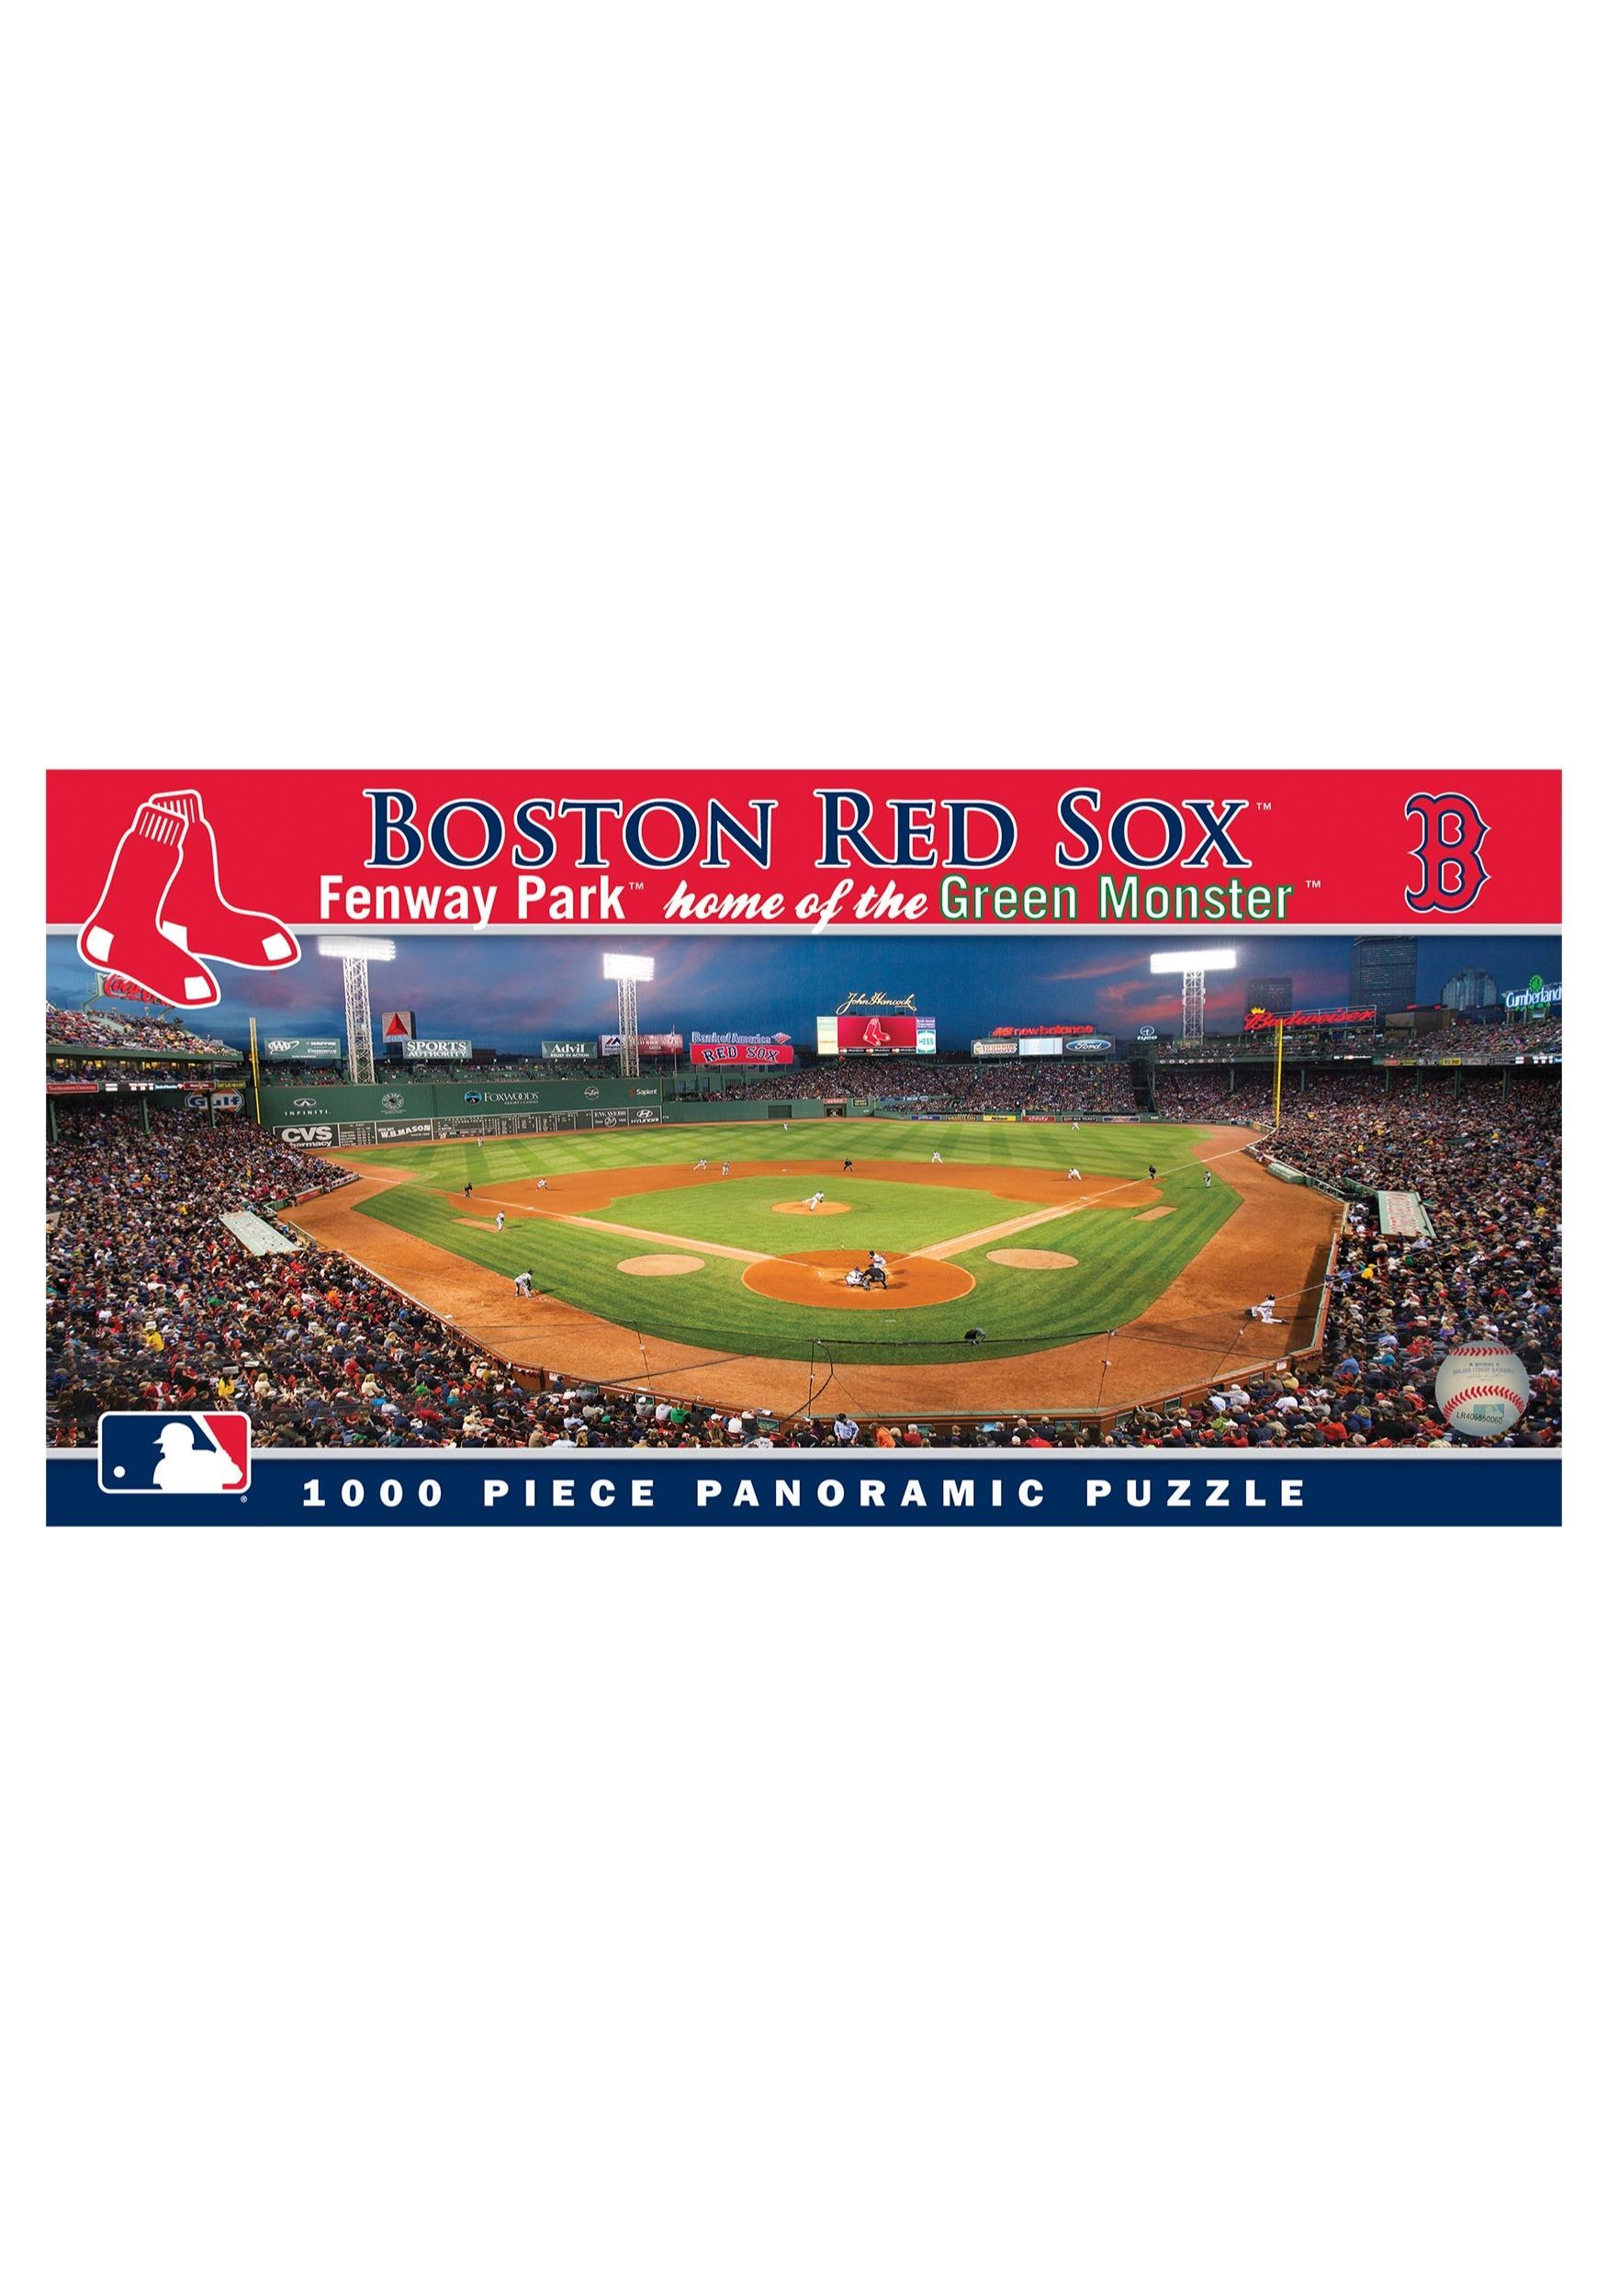 Boston Red Sox MLB 1000 Piece Stadium Puzzle